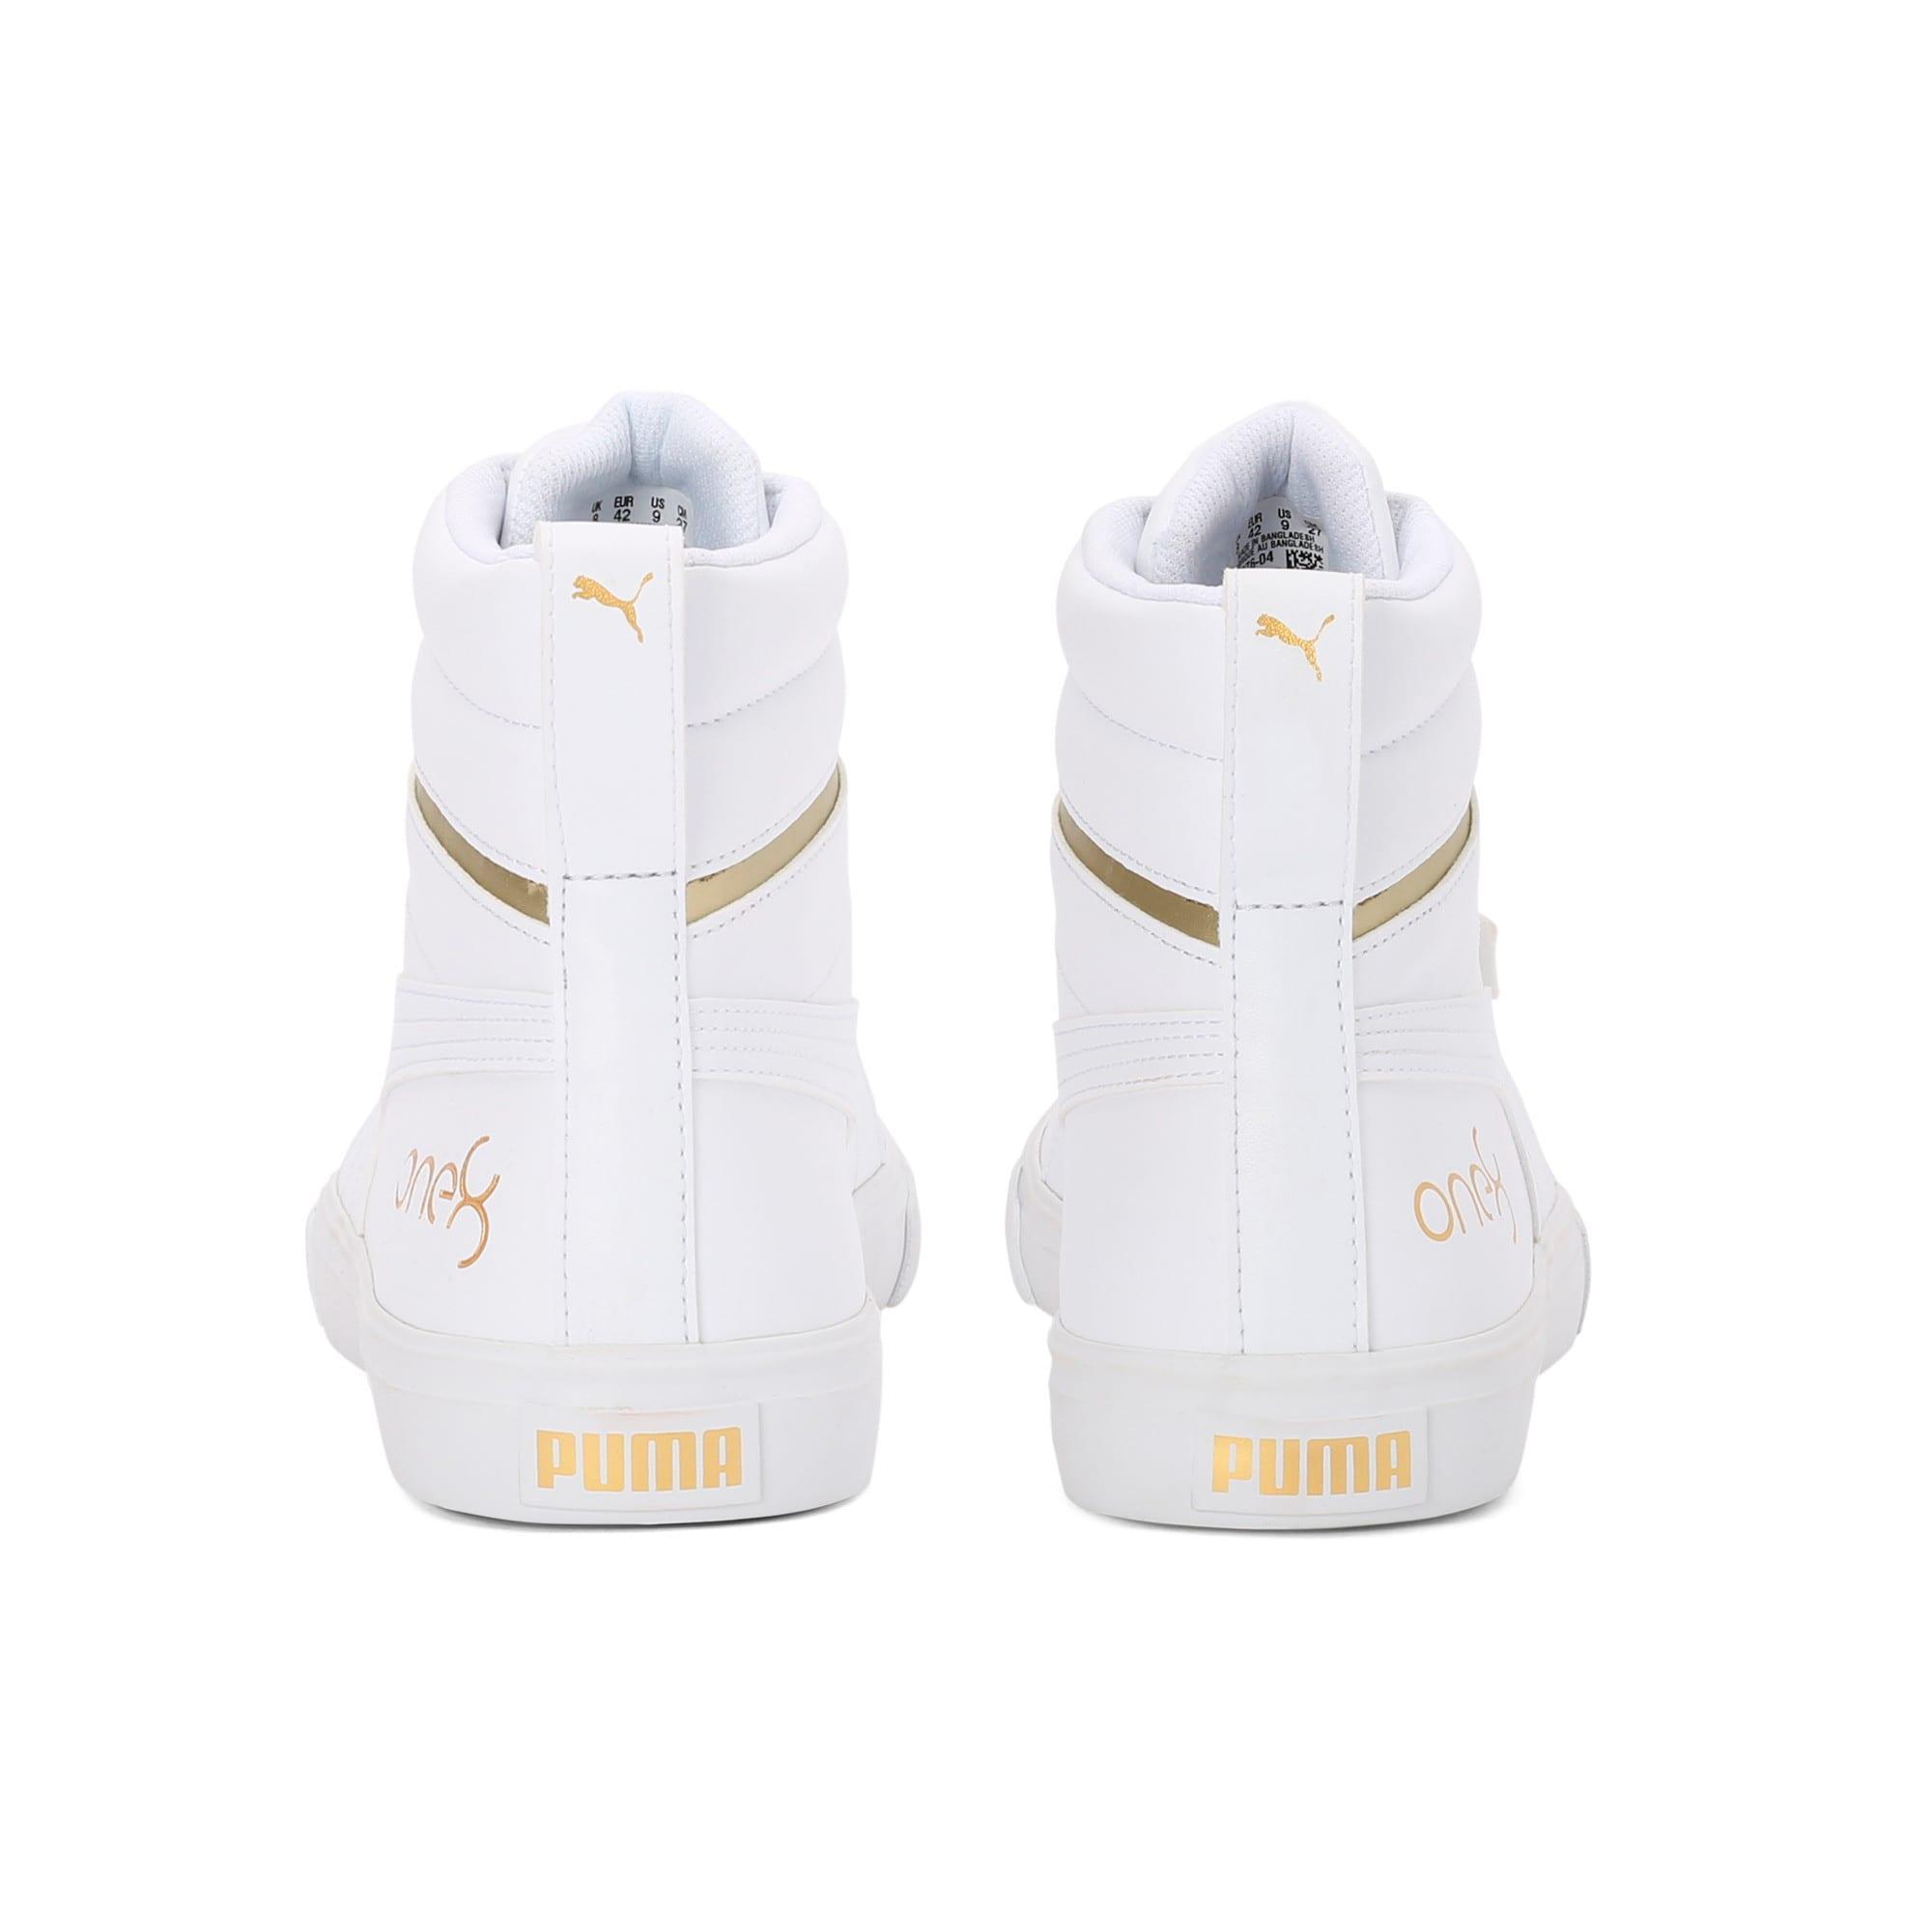 Thumbnail 3 of one8 Mid Men's Sneakers, Puma White-Puma Team Gold, medium-IND